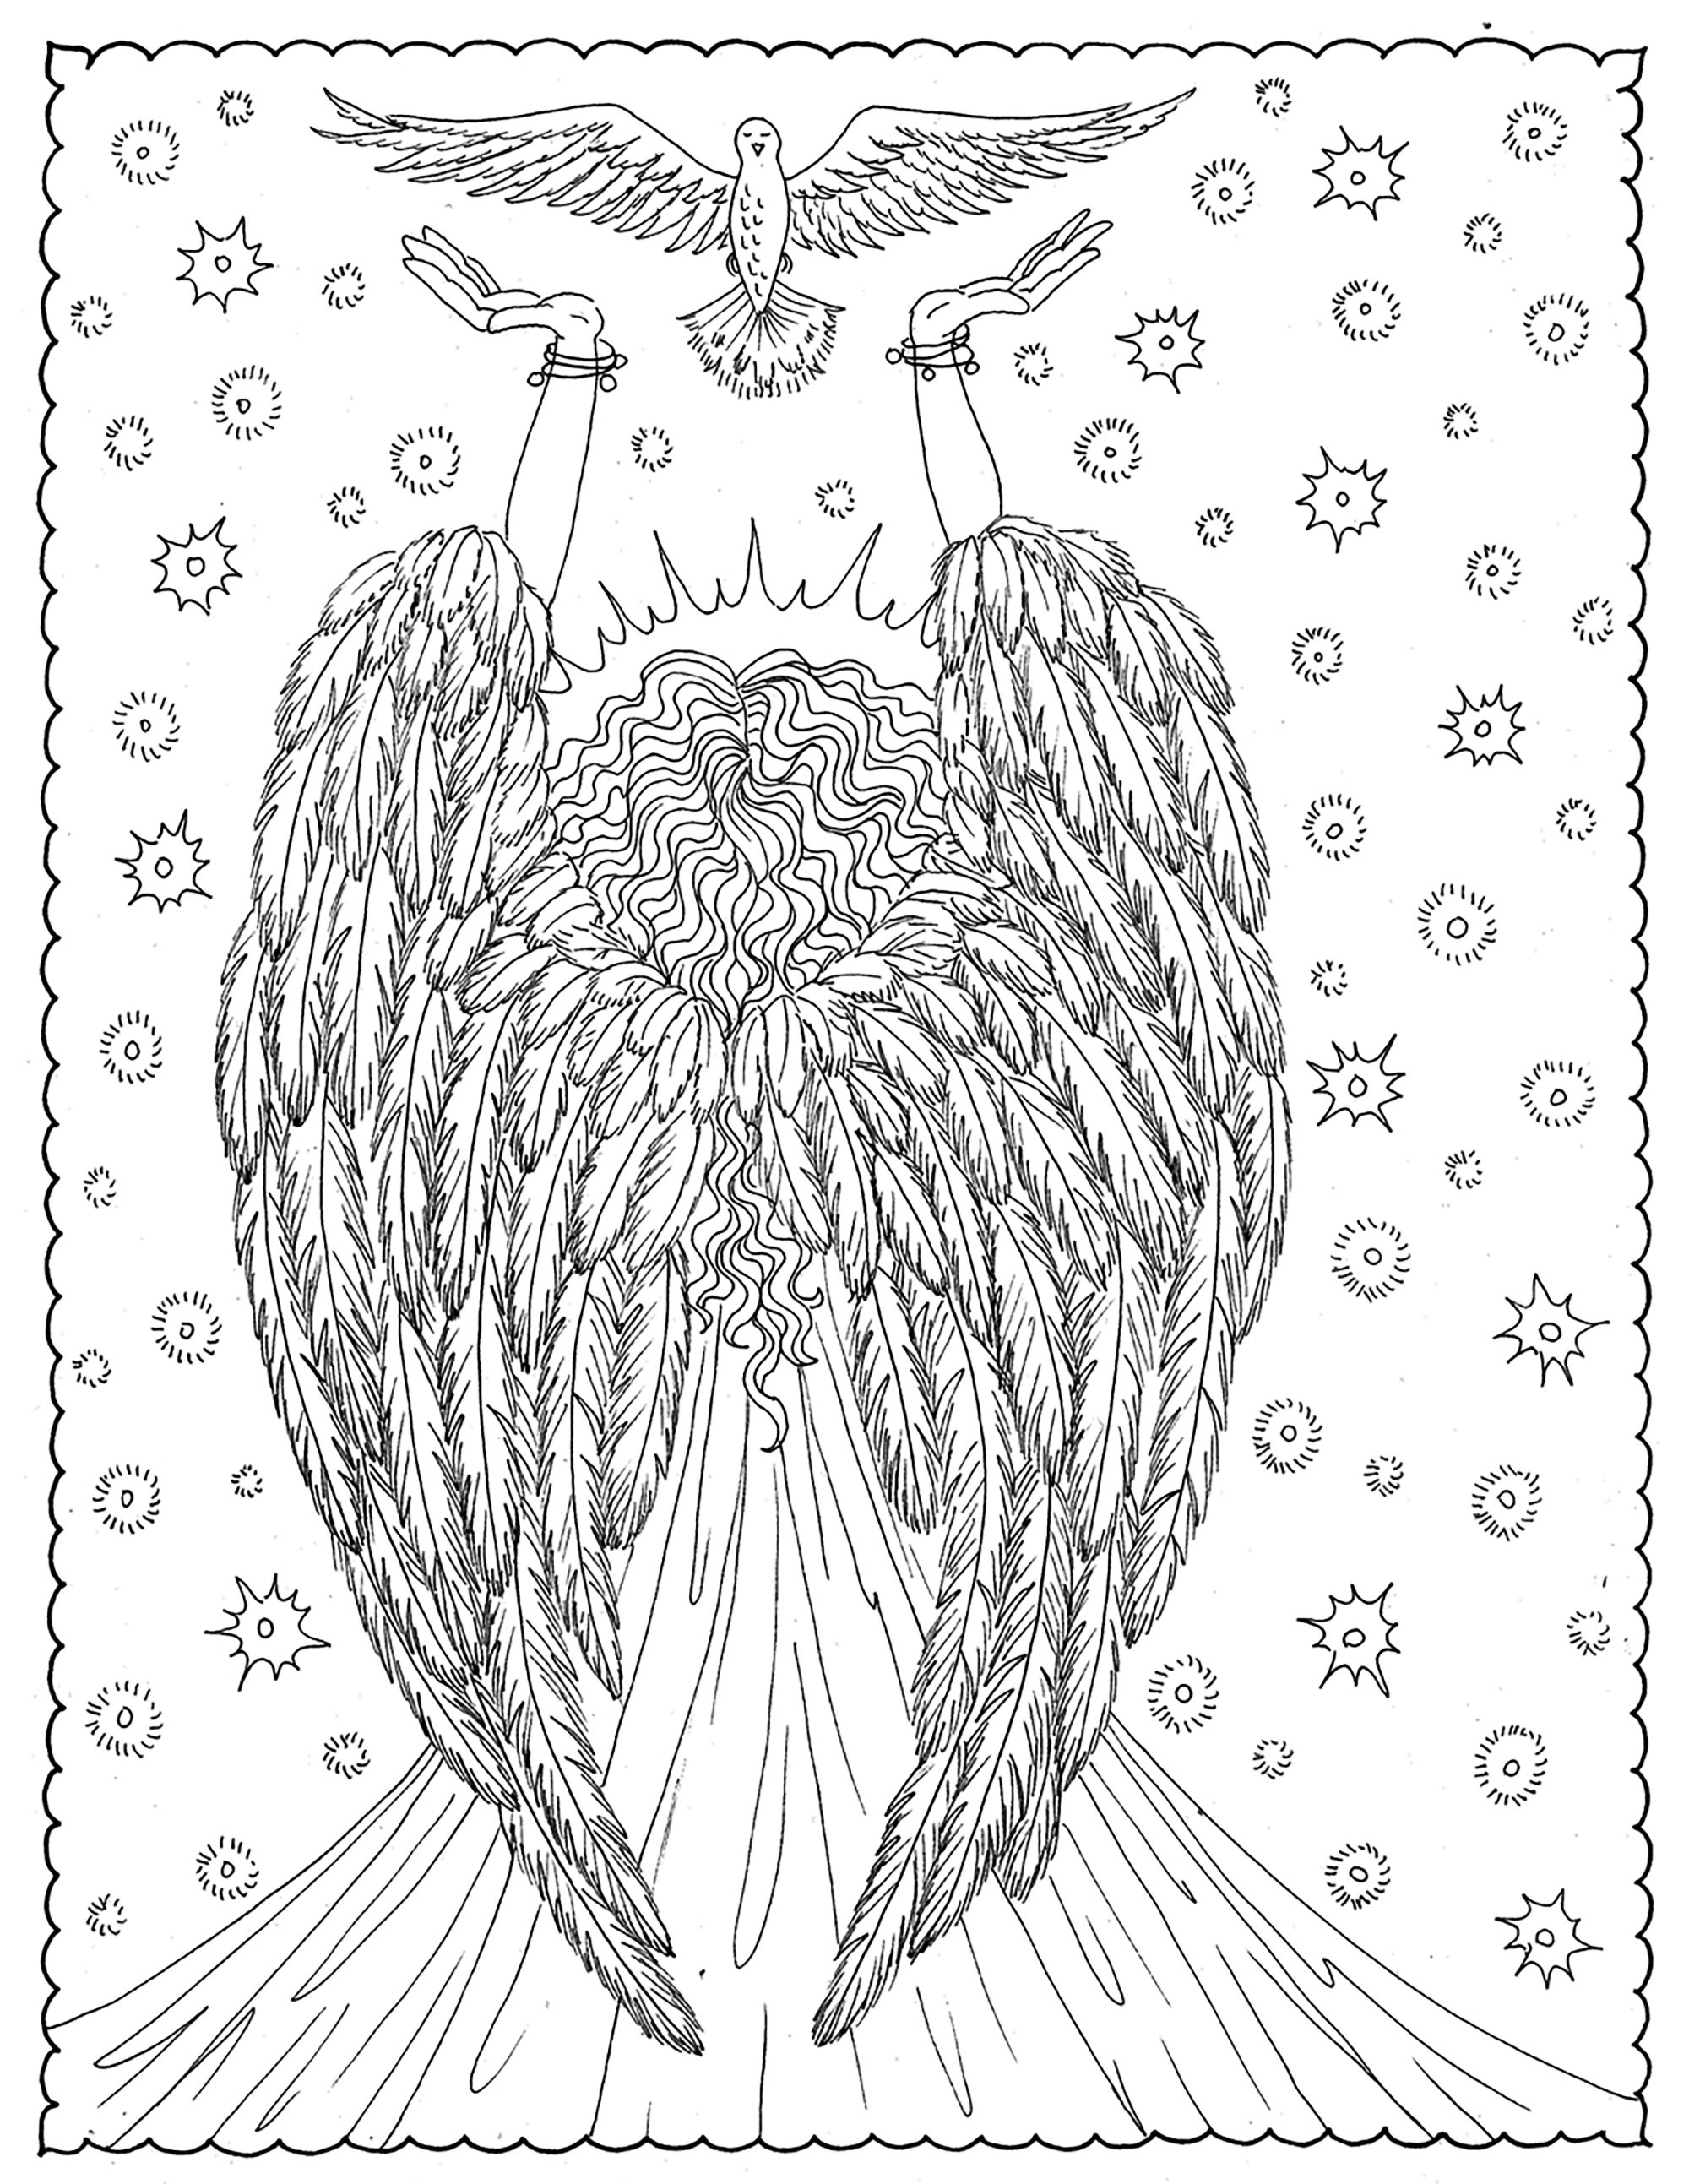 Angel of libertyFrom the gallery : Zen & Anti StressArtist : Deborah Muller